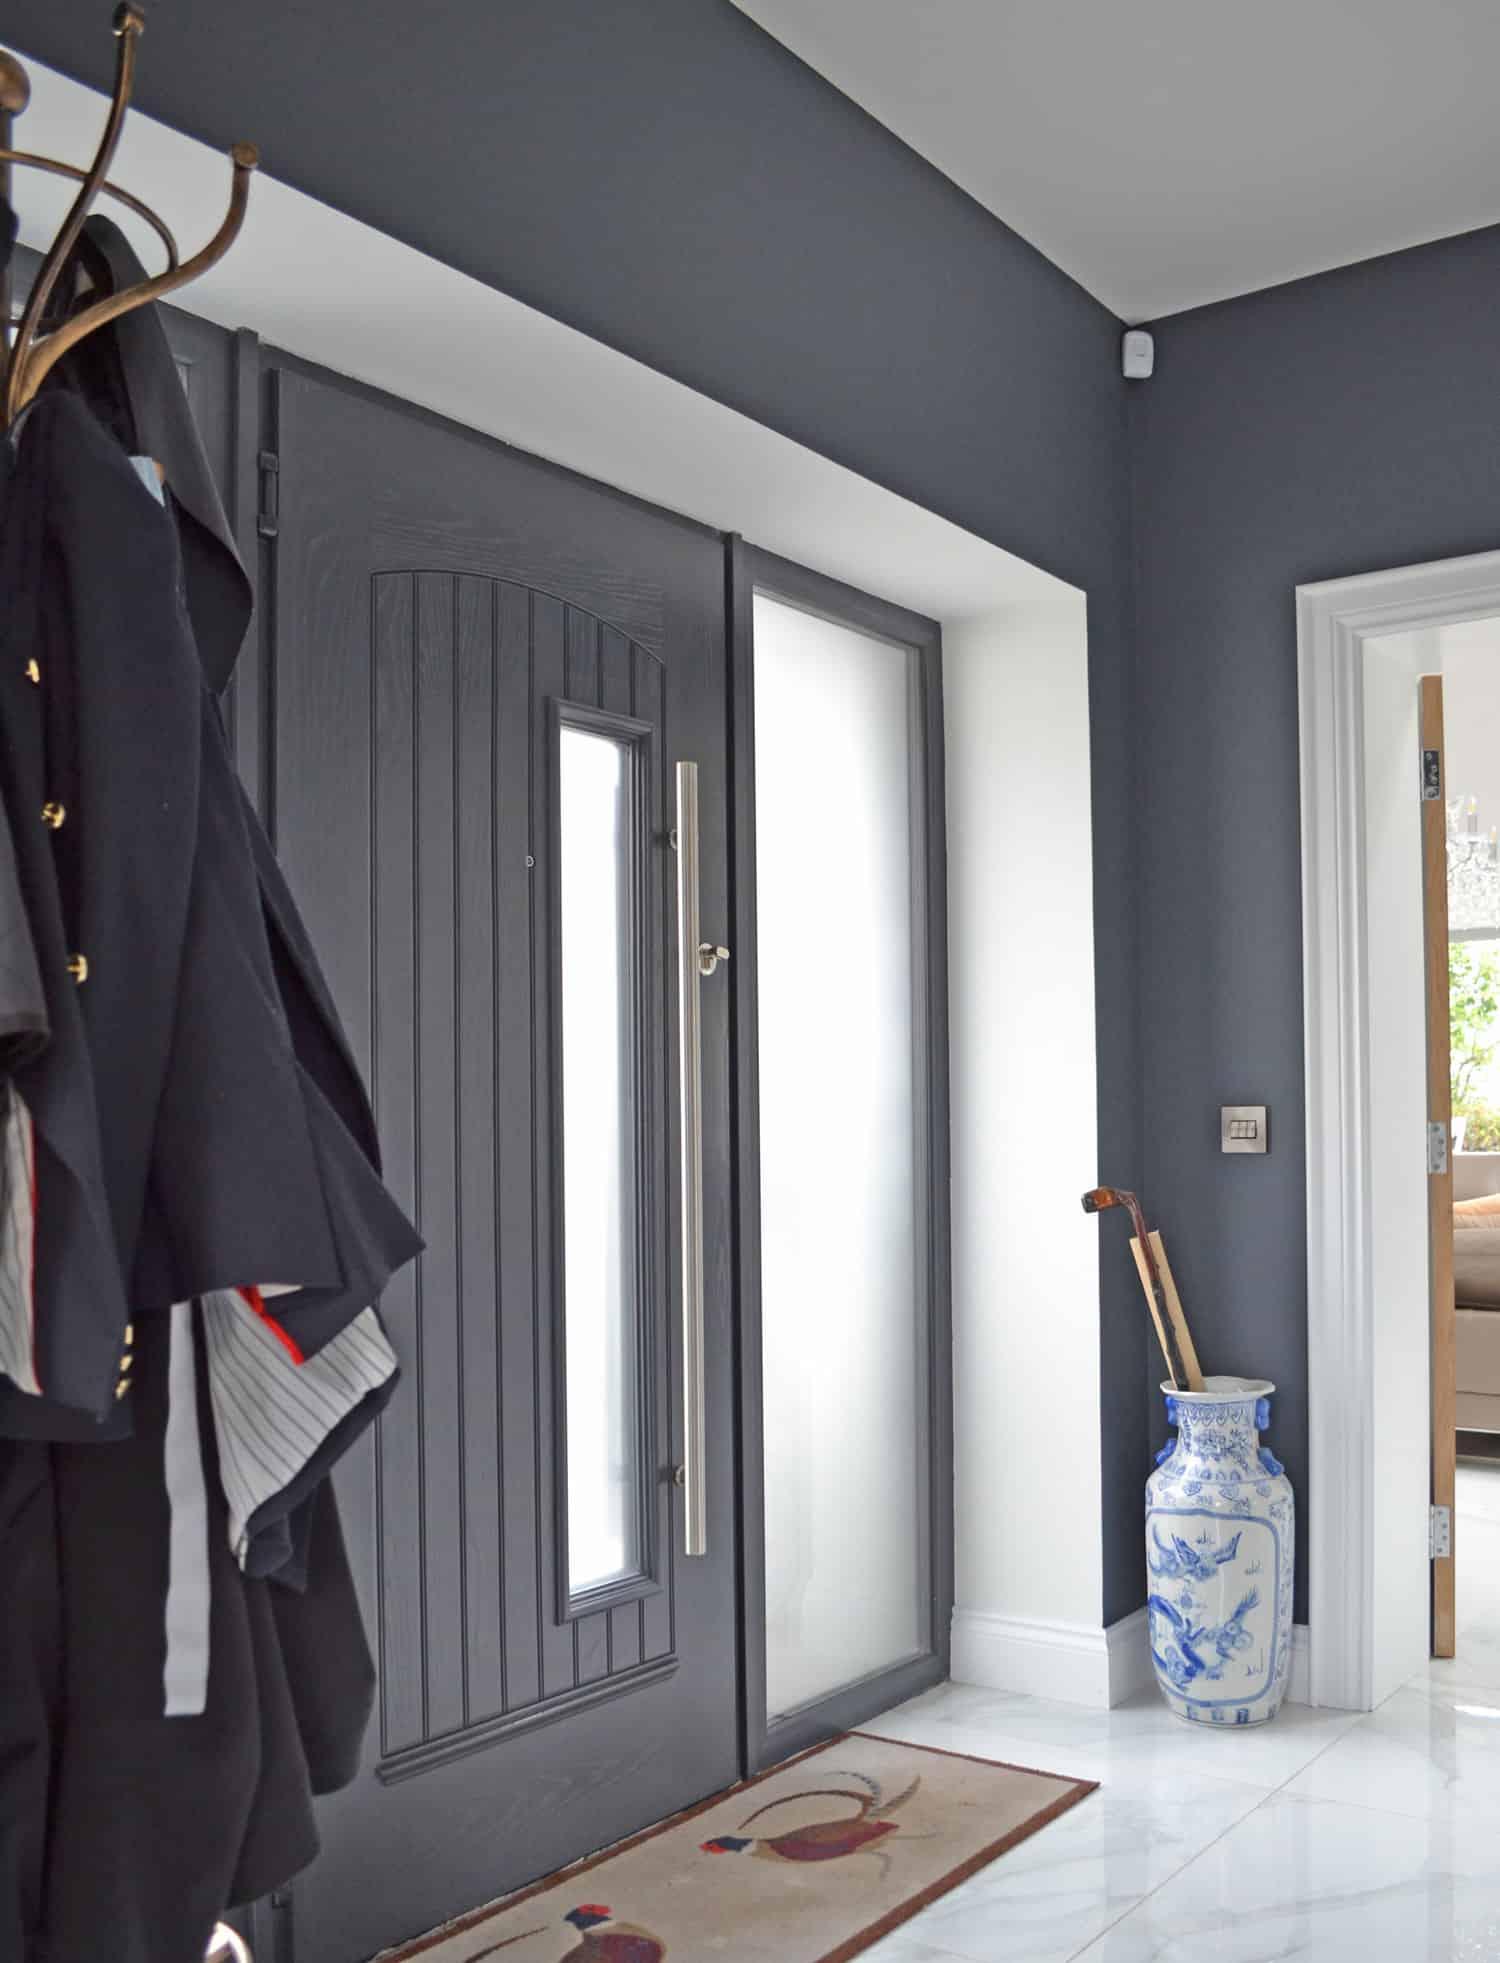 Fleming Dwelling - Rear Porch Composite Entrance Door